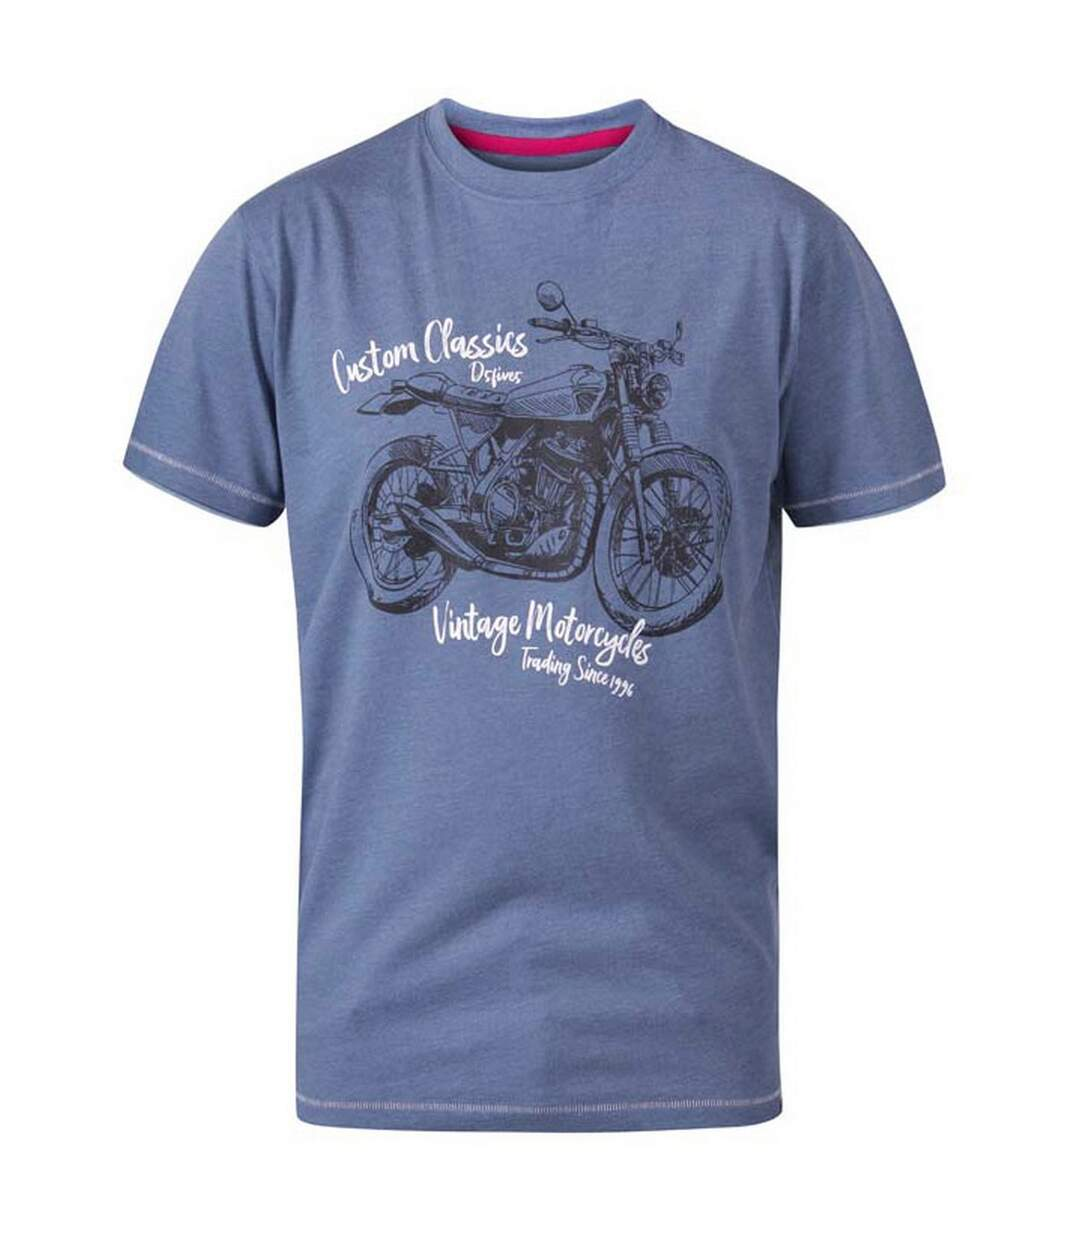 Duke Mens Conor D555 Custom Classic Motorcycle T-Shirt (Denim Marl) - UTDC287